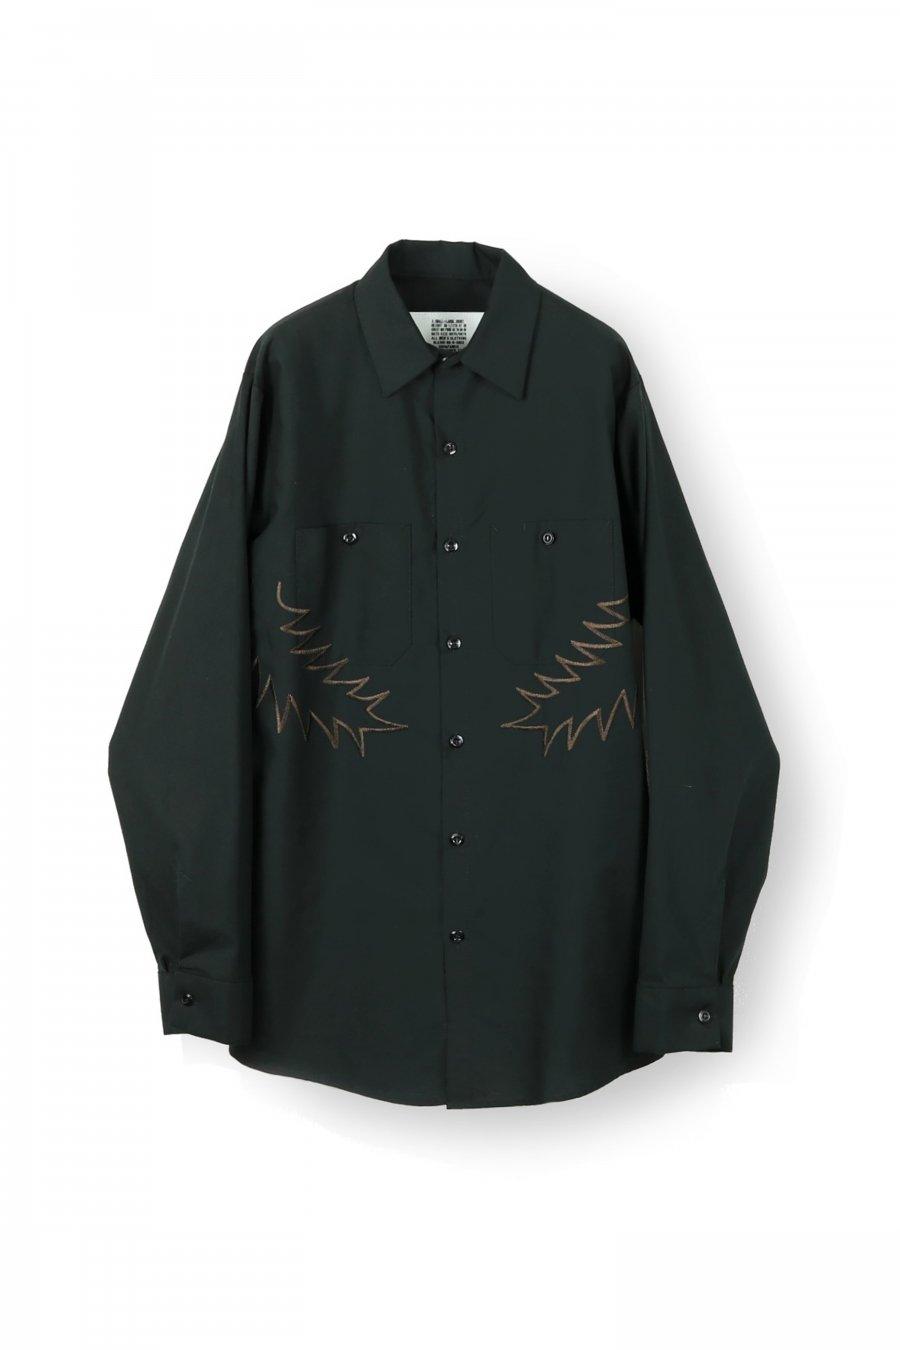 elephant TRIBAL fabrics  Palm leaf embroidery work shirt(BLACK)<img class='new_mark_img2' src='https://img.shop-pro.jp/img/new/icons15.gif' style='border:none;display:inline;margin:0px;padding:0px;width:auto;' />